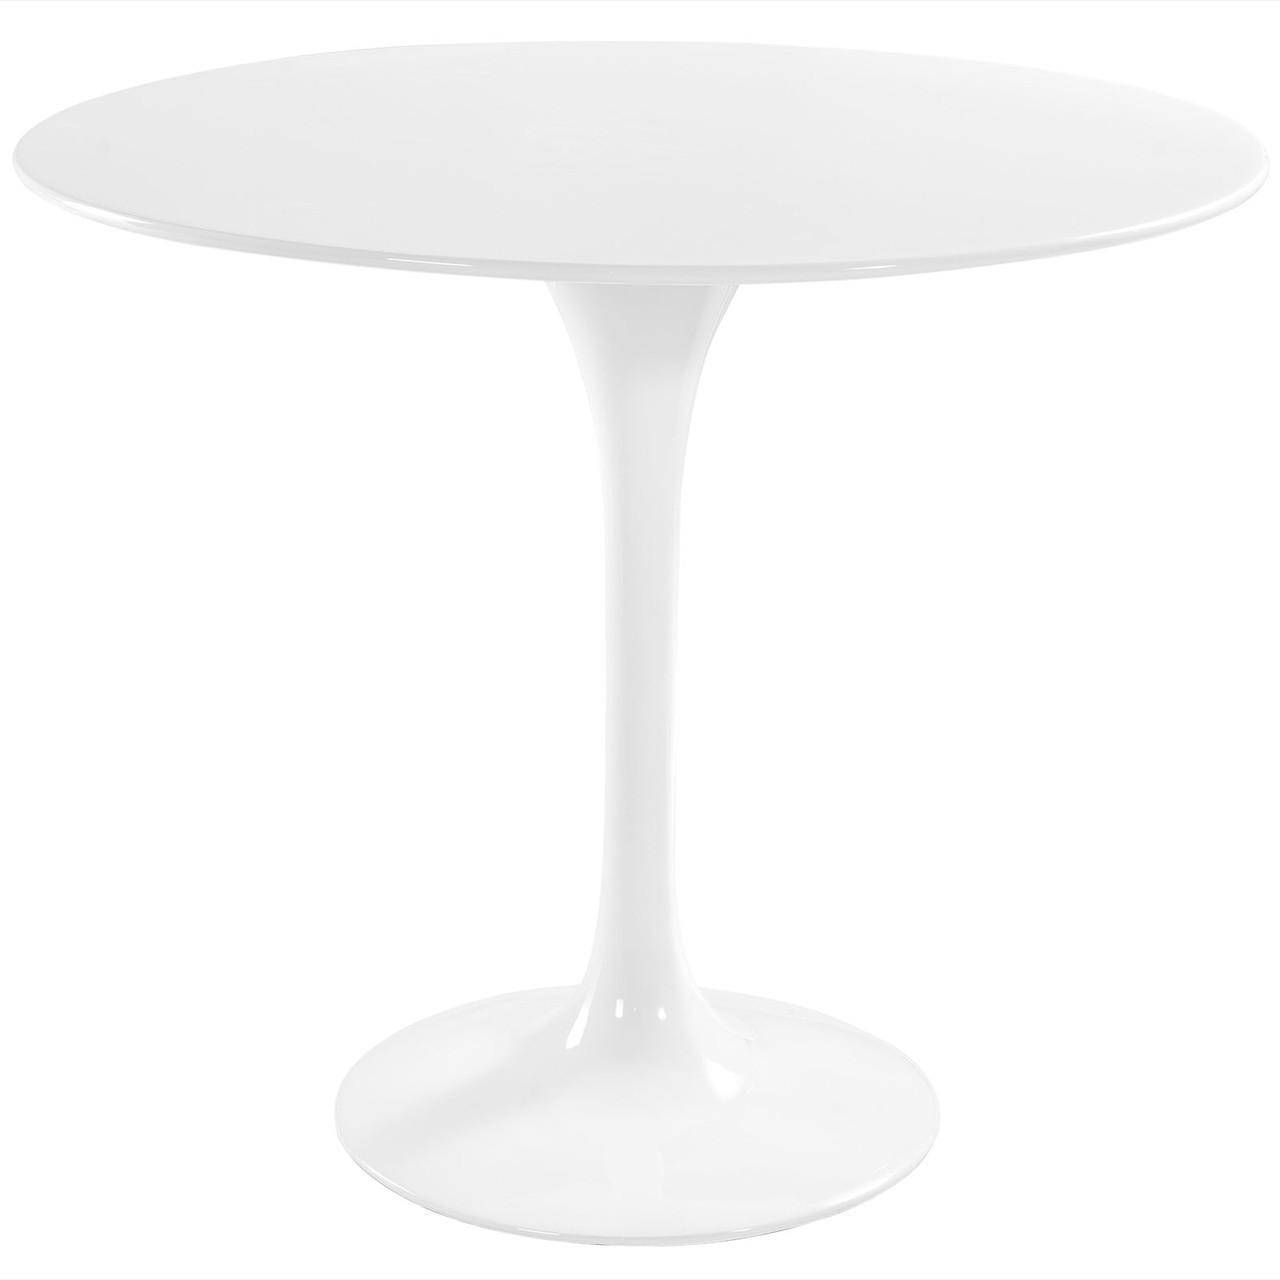 "Lippa 36"" Round Fiberglass Dining Table"